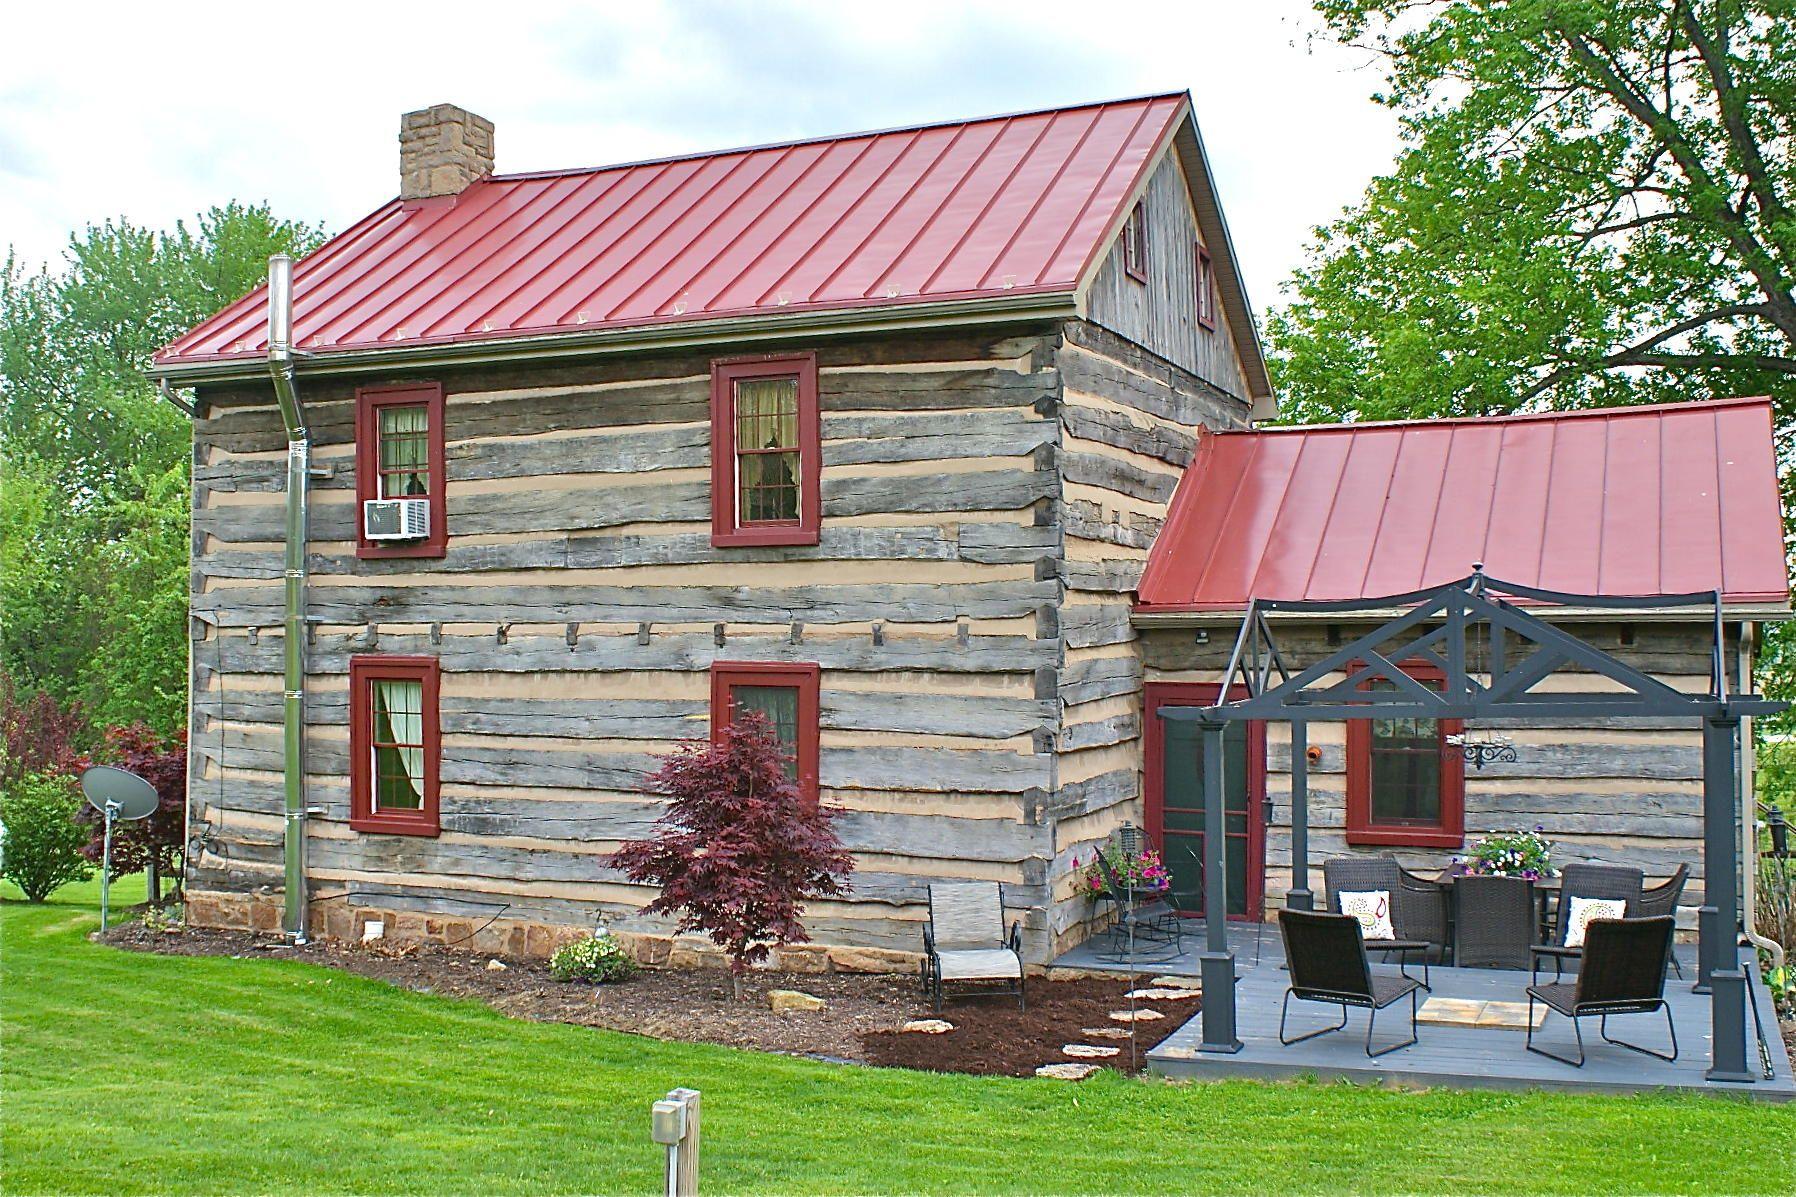 clck to close... Pennsylvania log home Log cabin exterior